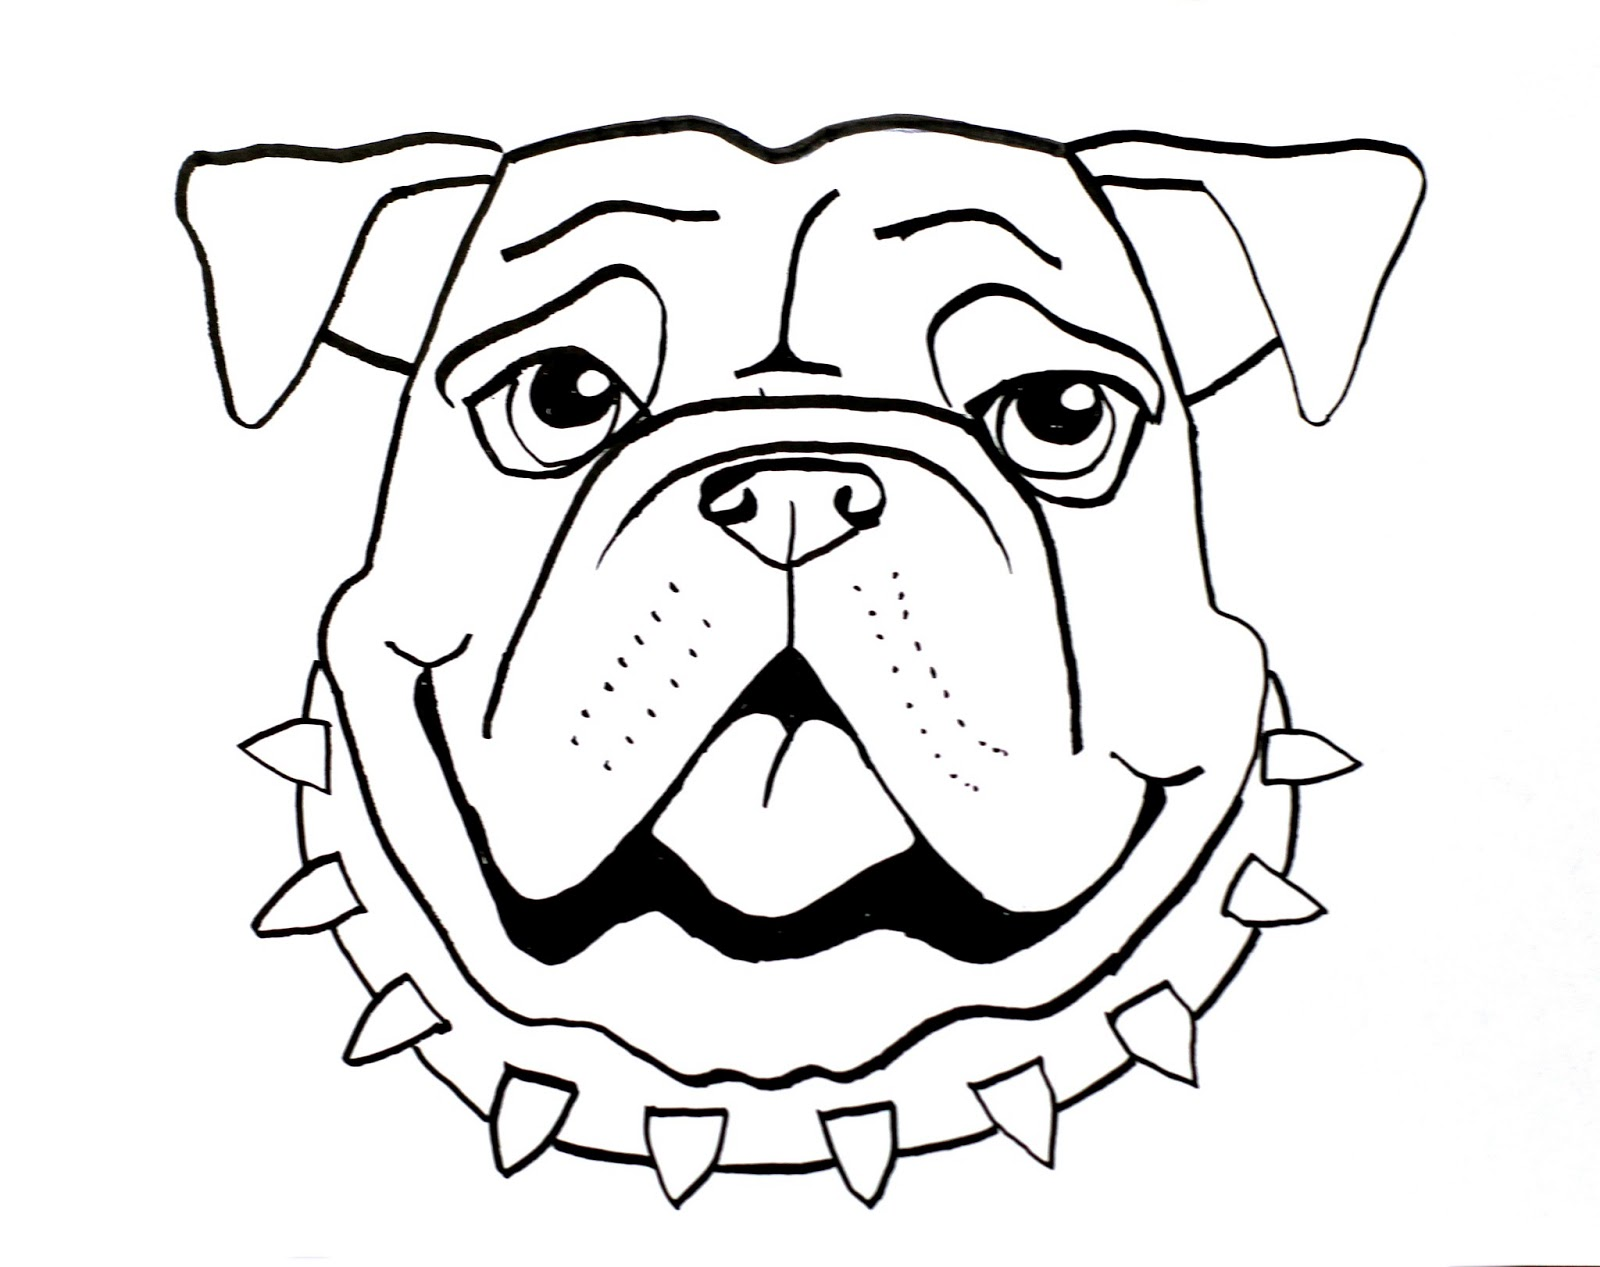 Drawn bulldog Through Bull in middle coming